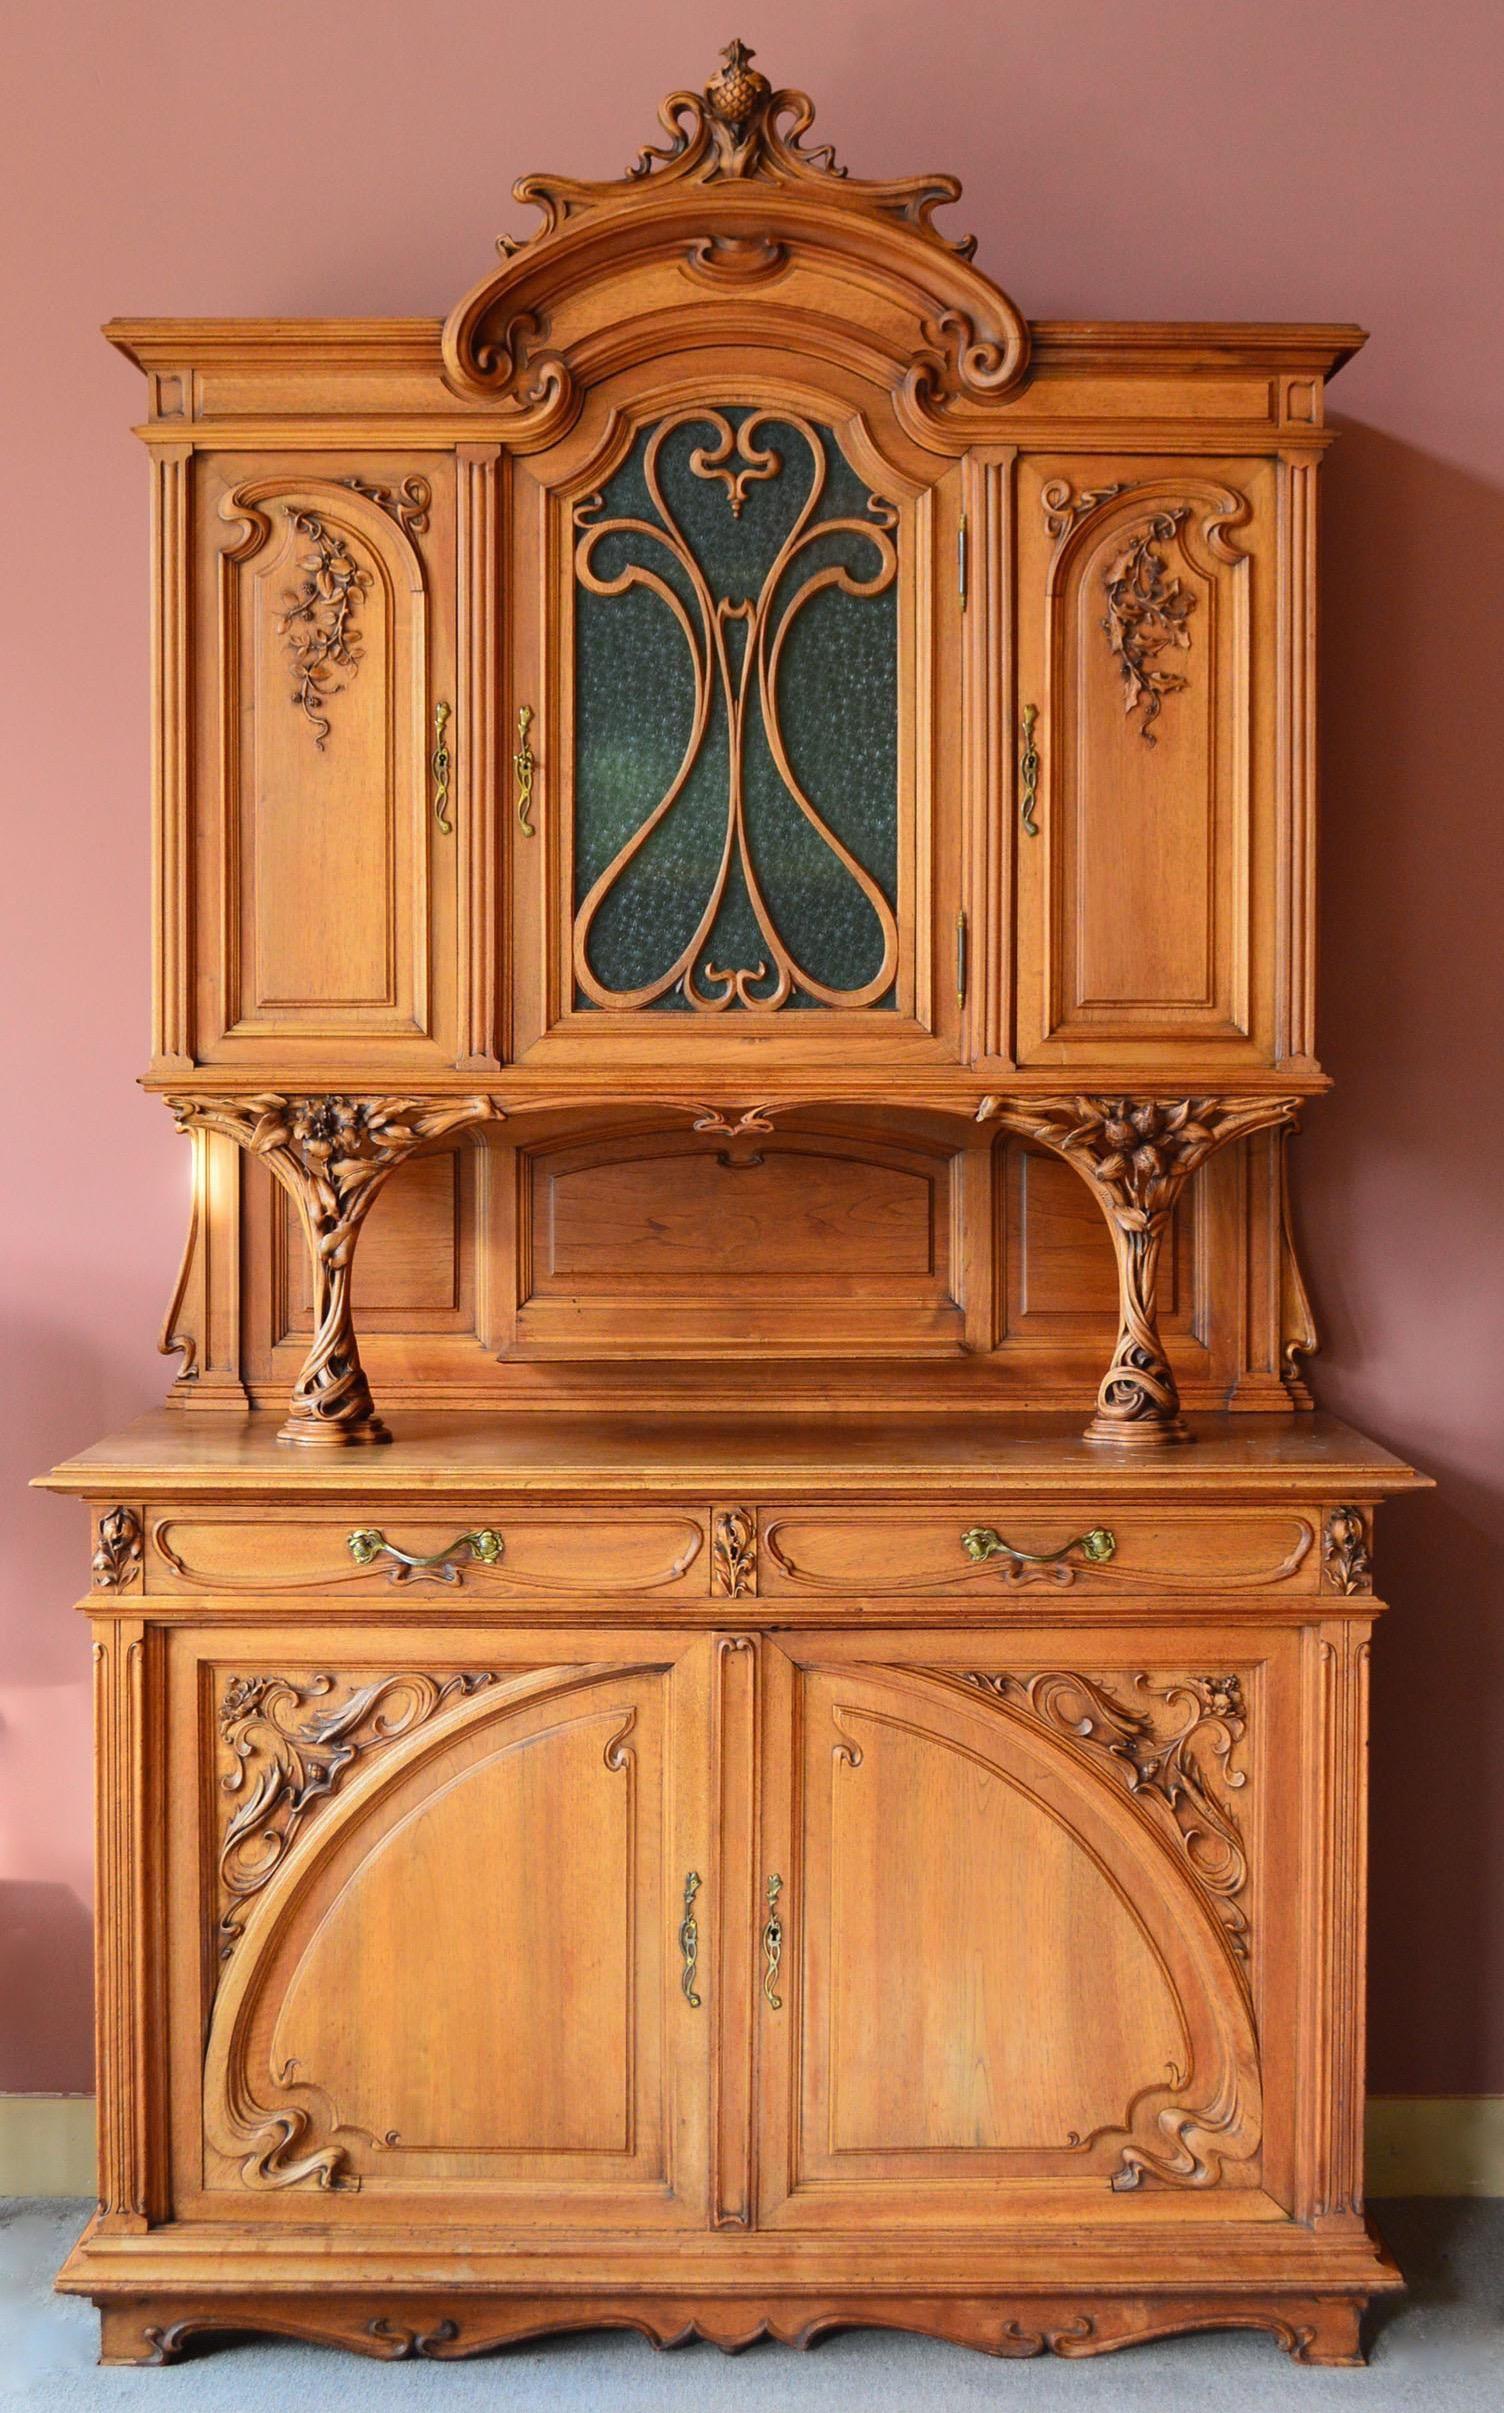 1878 1910 French Art Nouveau Hand Carved Breakfront Server Sideboard In 2020 Art Nouveau Furniture Art Nouveau Breakfront